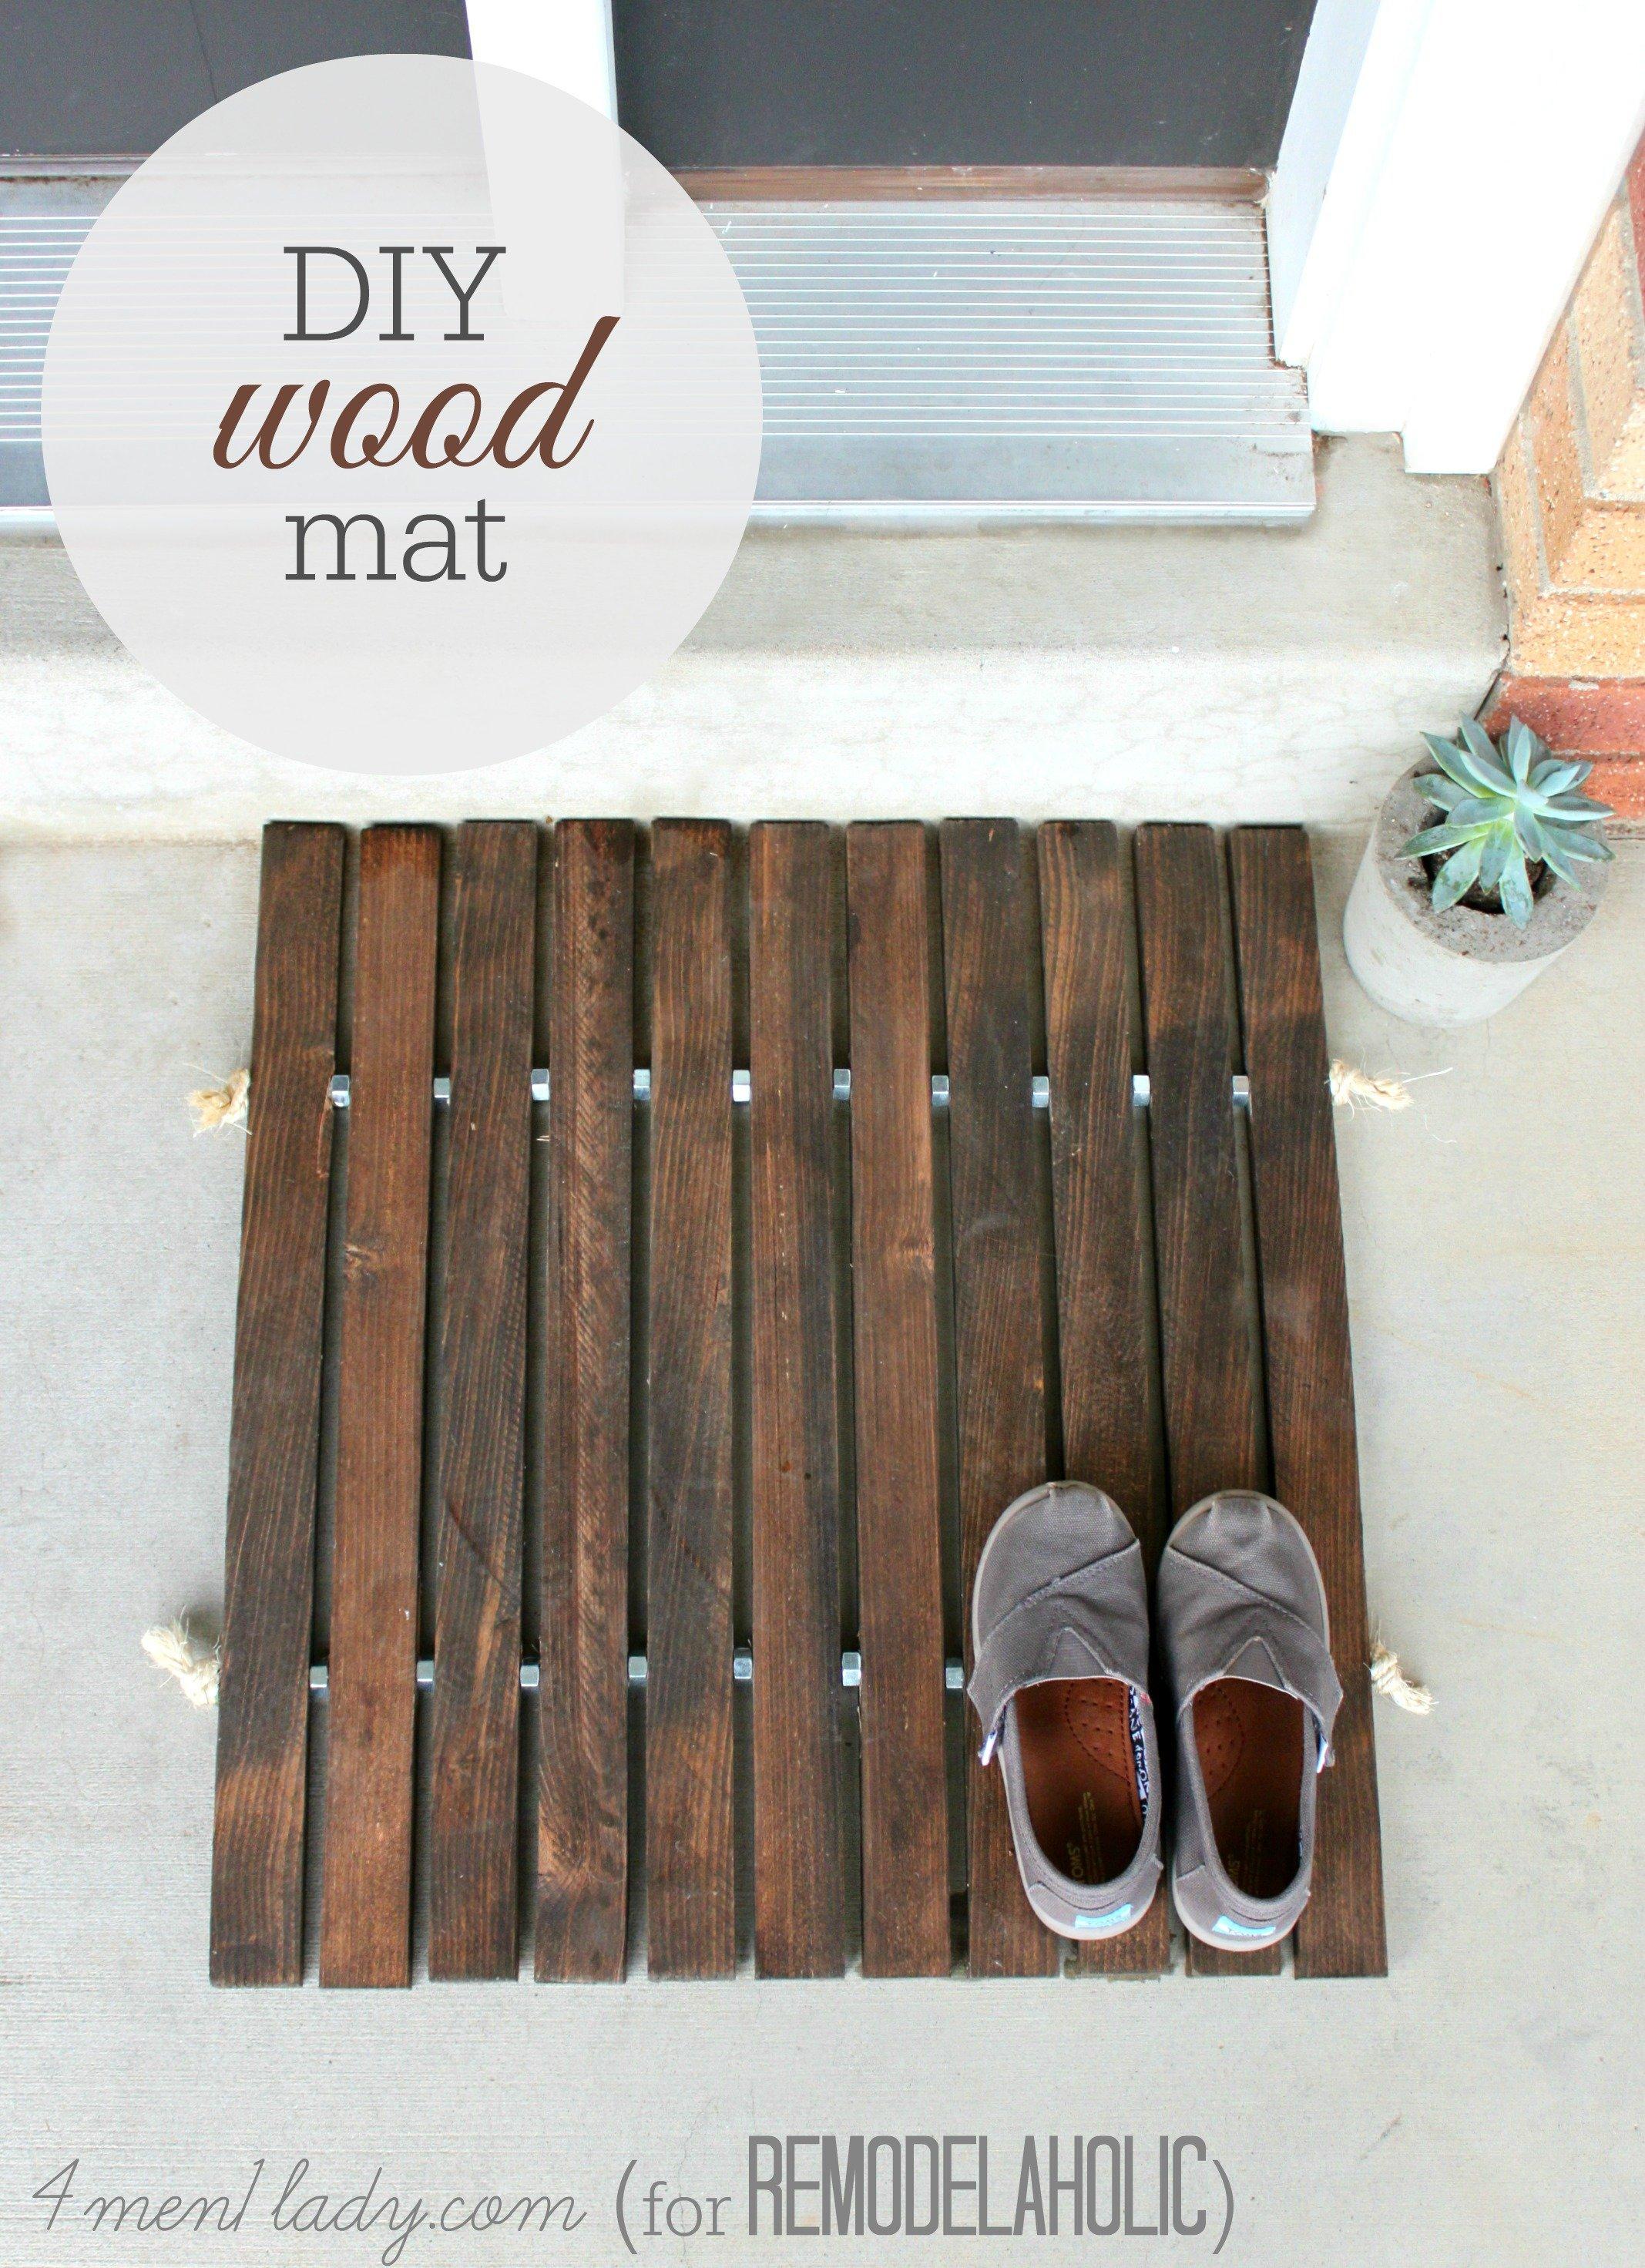 DIY Wood Mat by (4men1lady.com for @Remodelaholic)